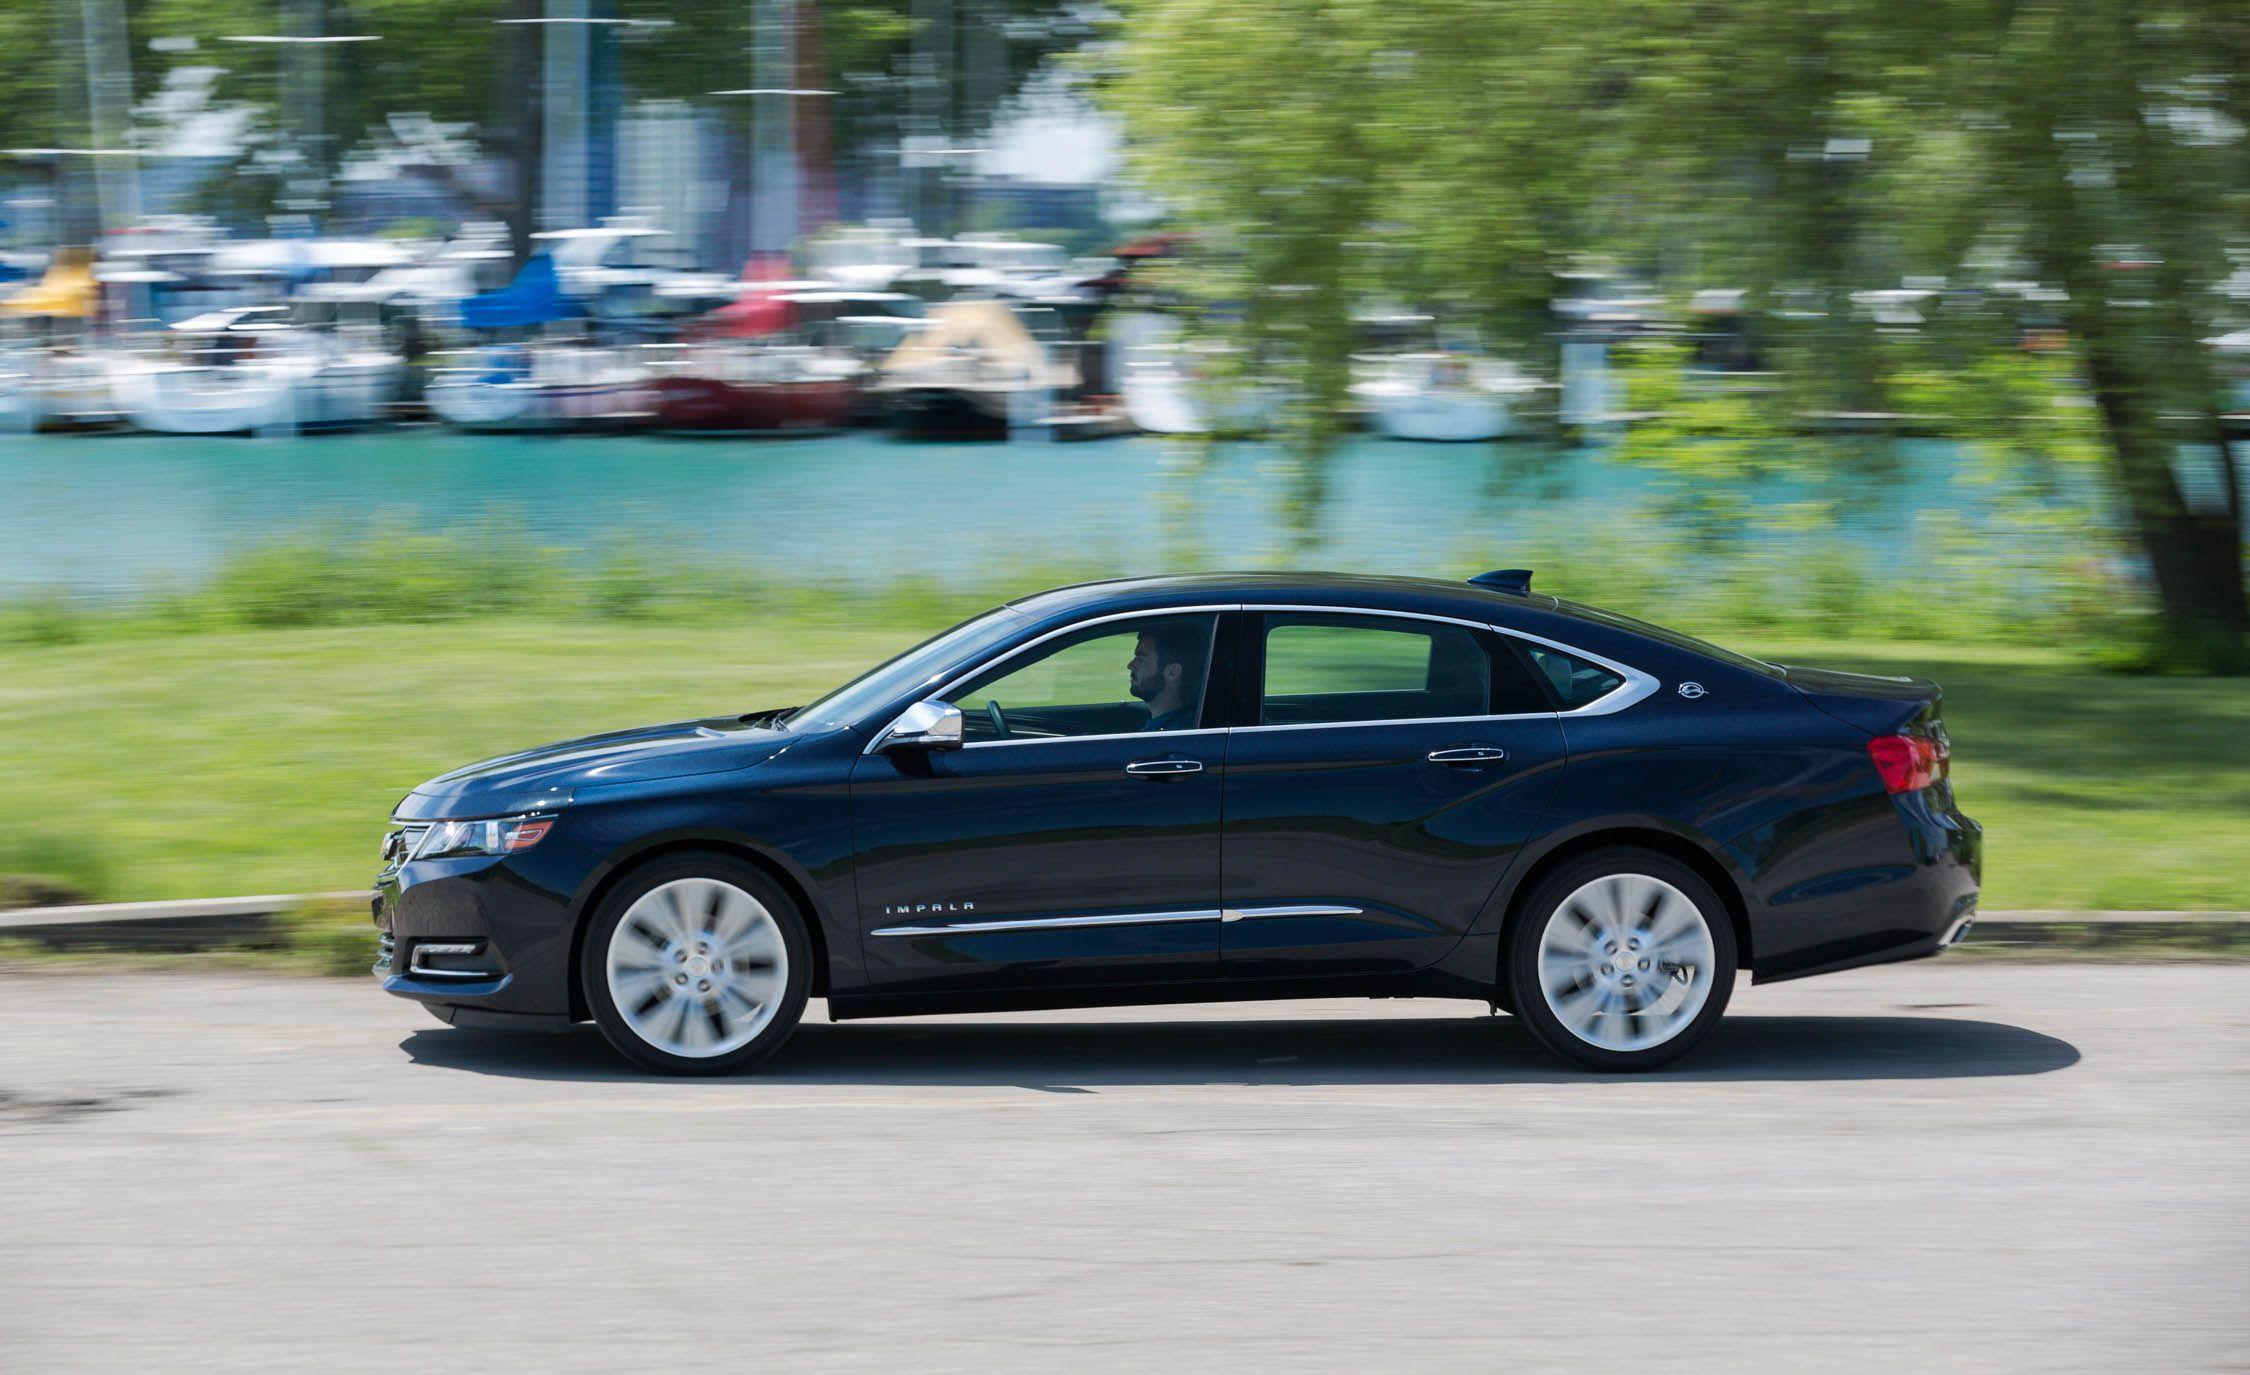 Chevy Impala 2018 Ltz >> 2018 Chevrolet Impala V 6 Tested Why Does It Remind Us Of 1961